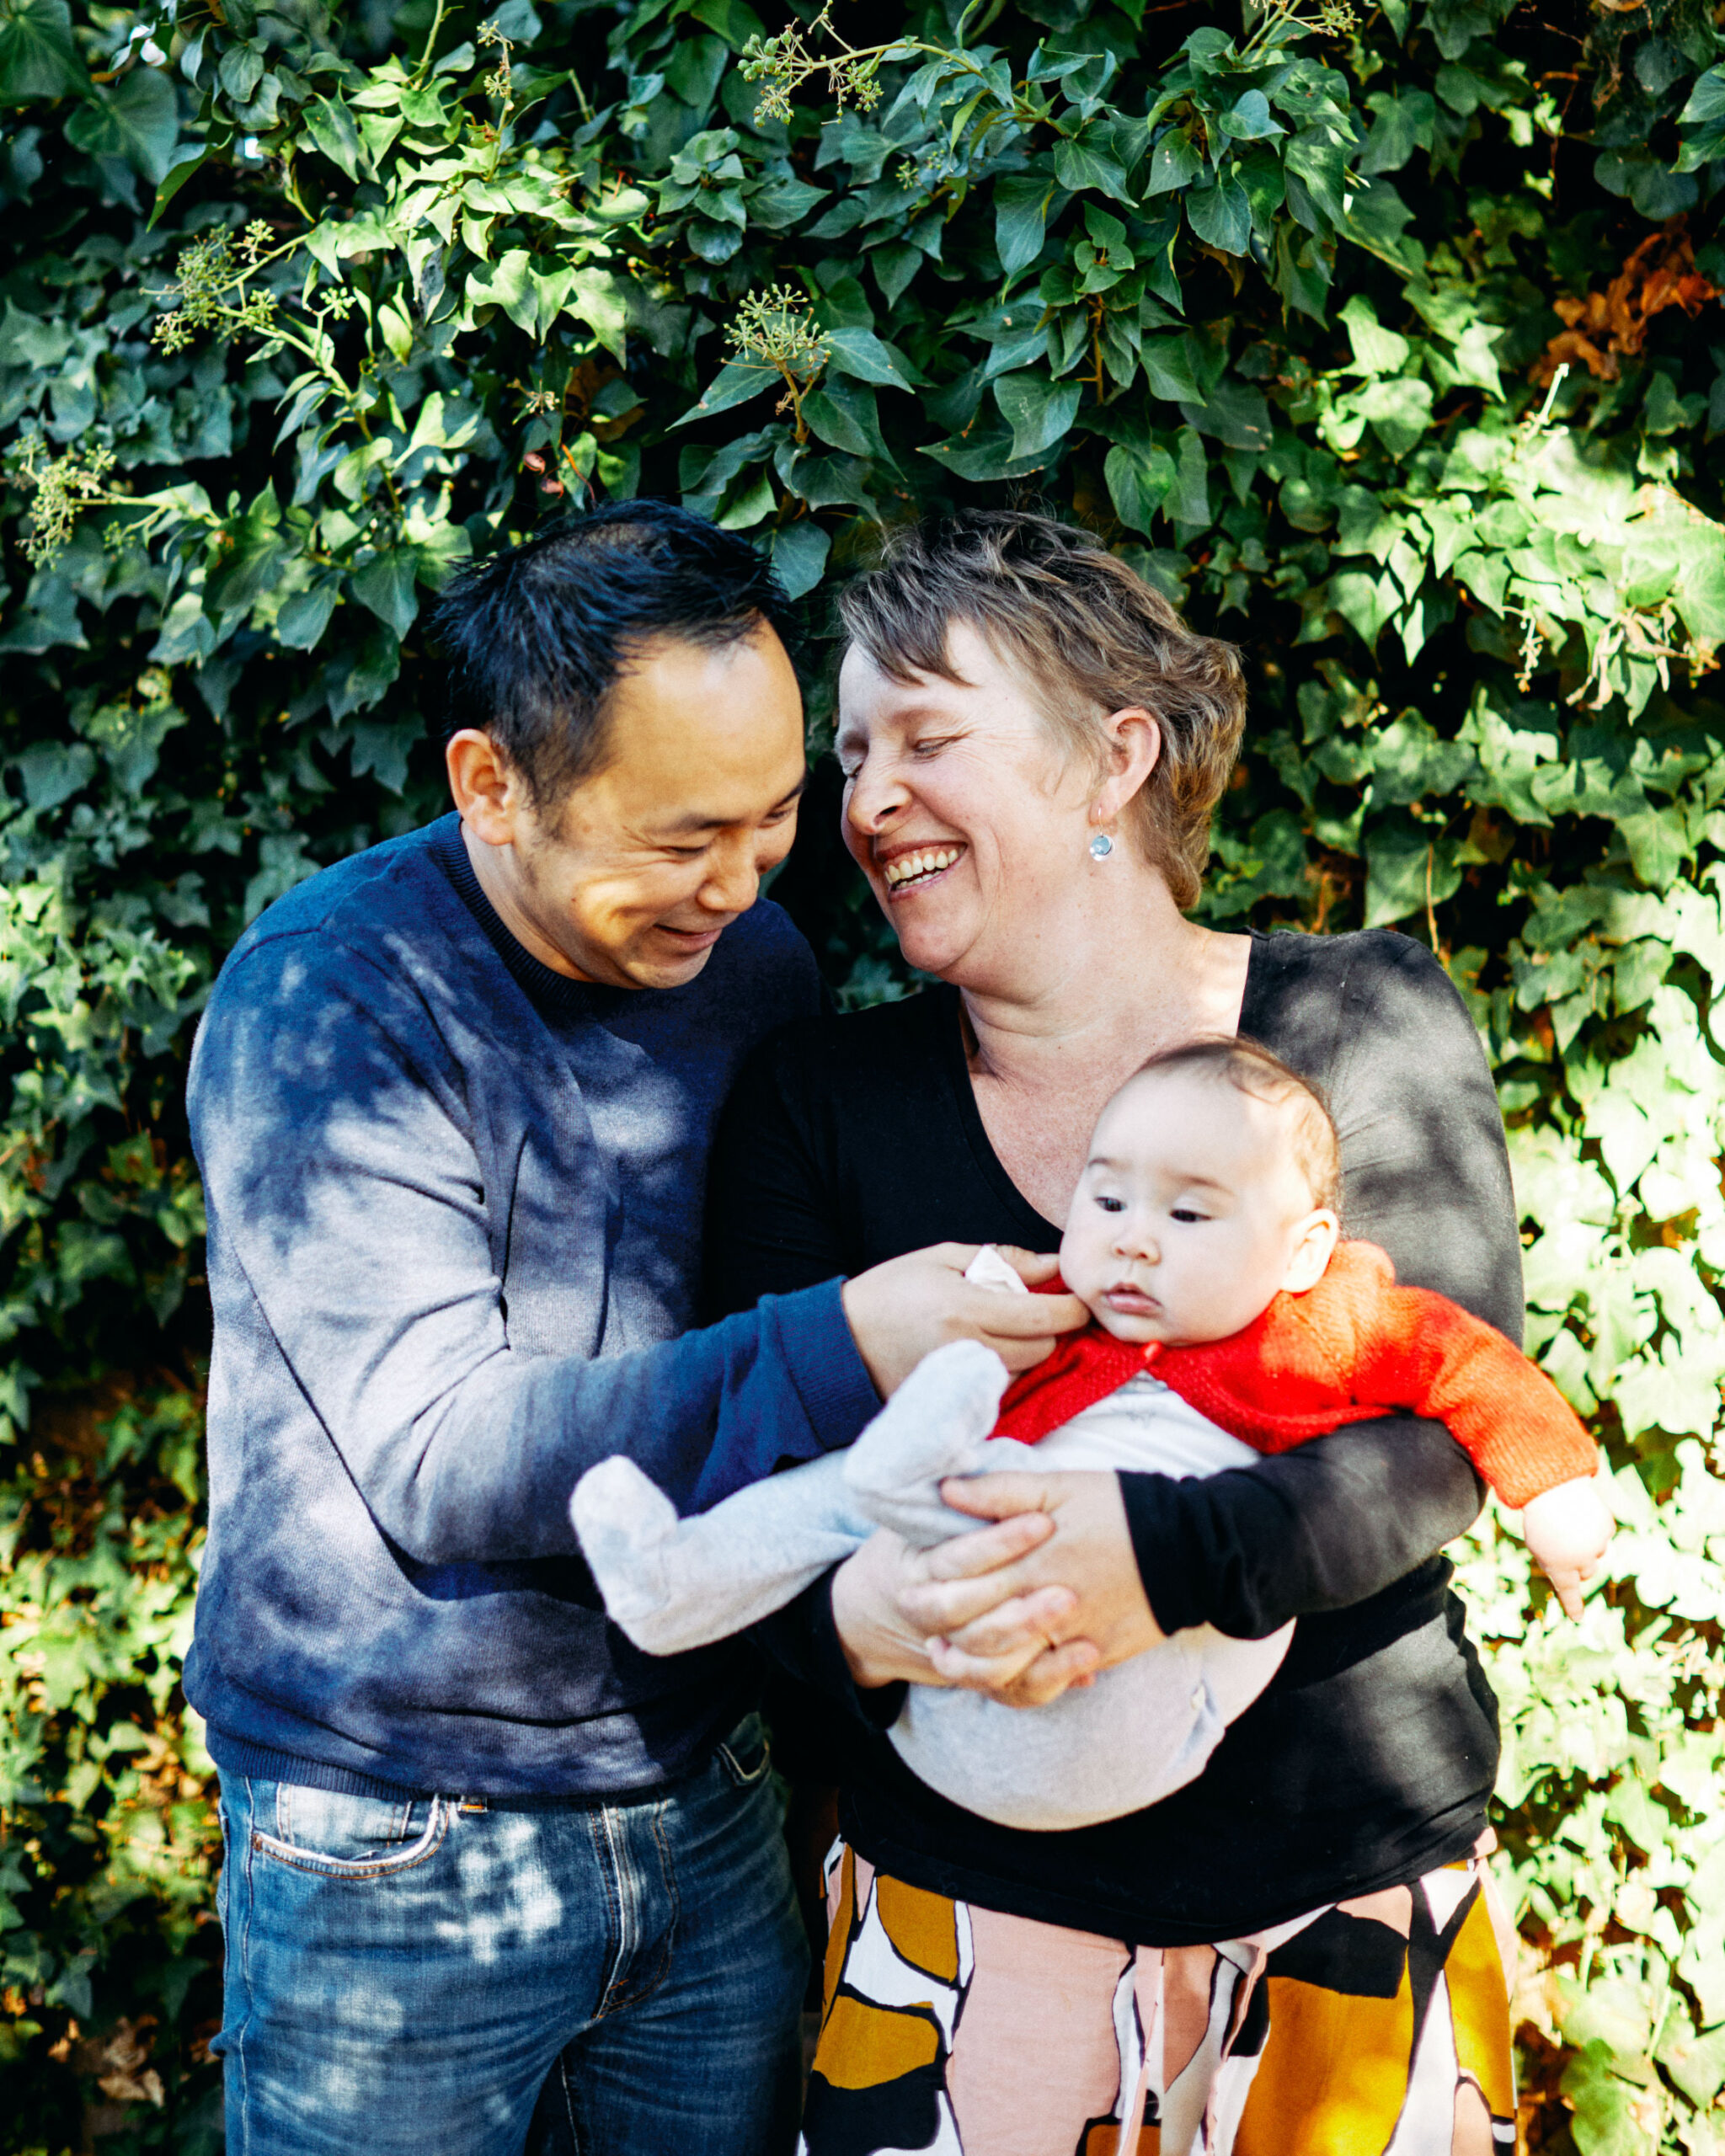 new born melbourne family portrait in backyard